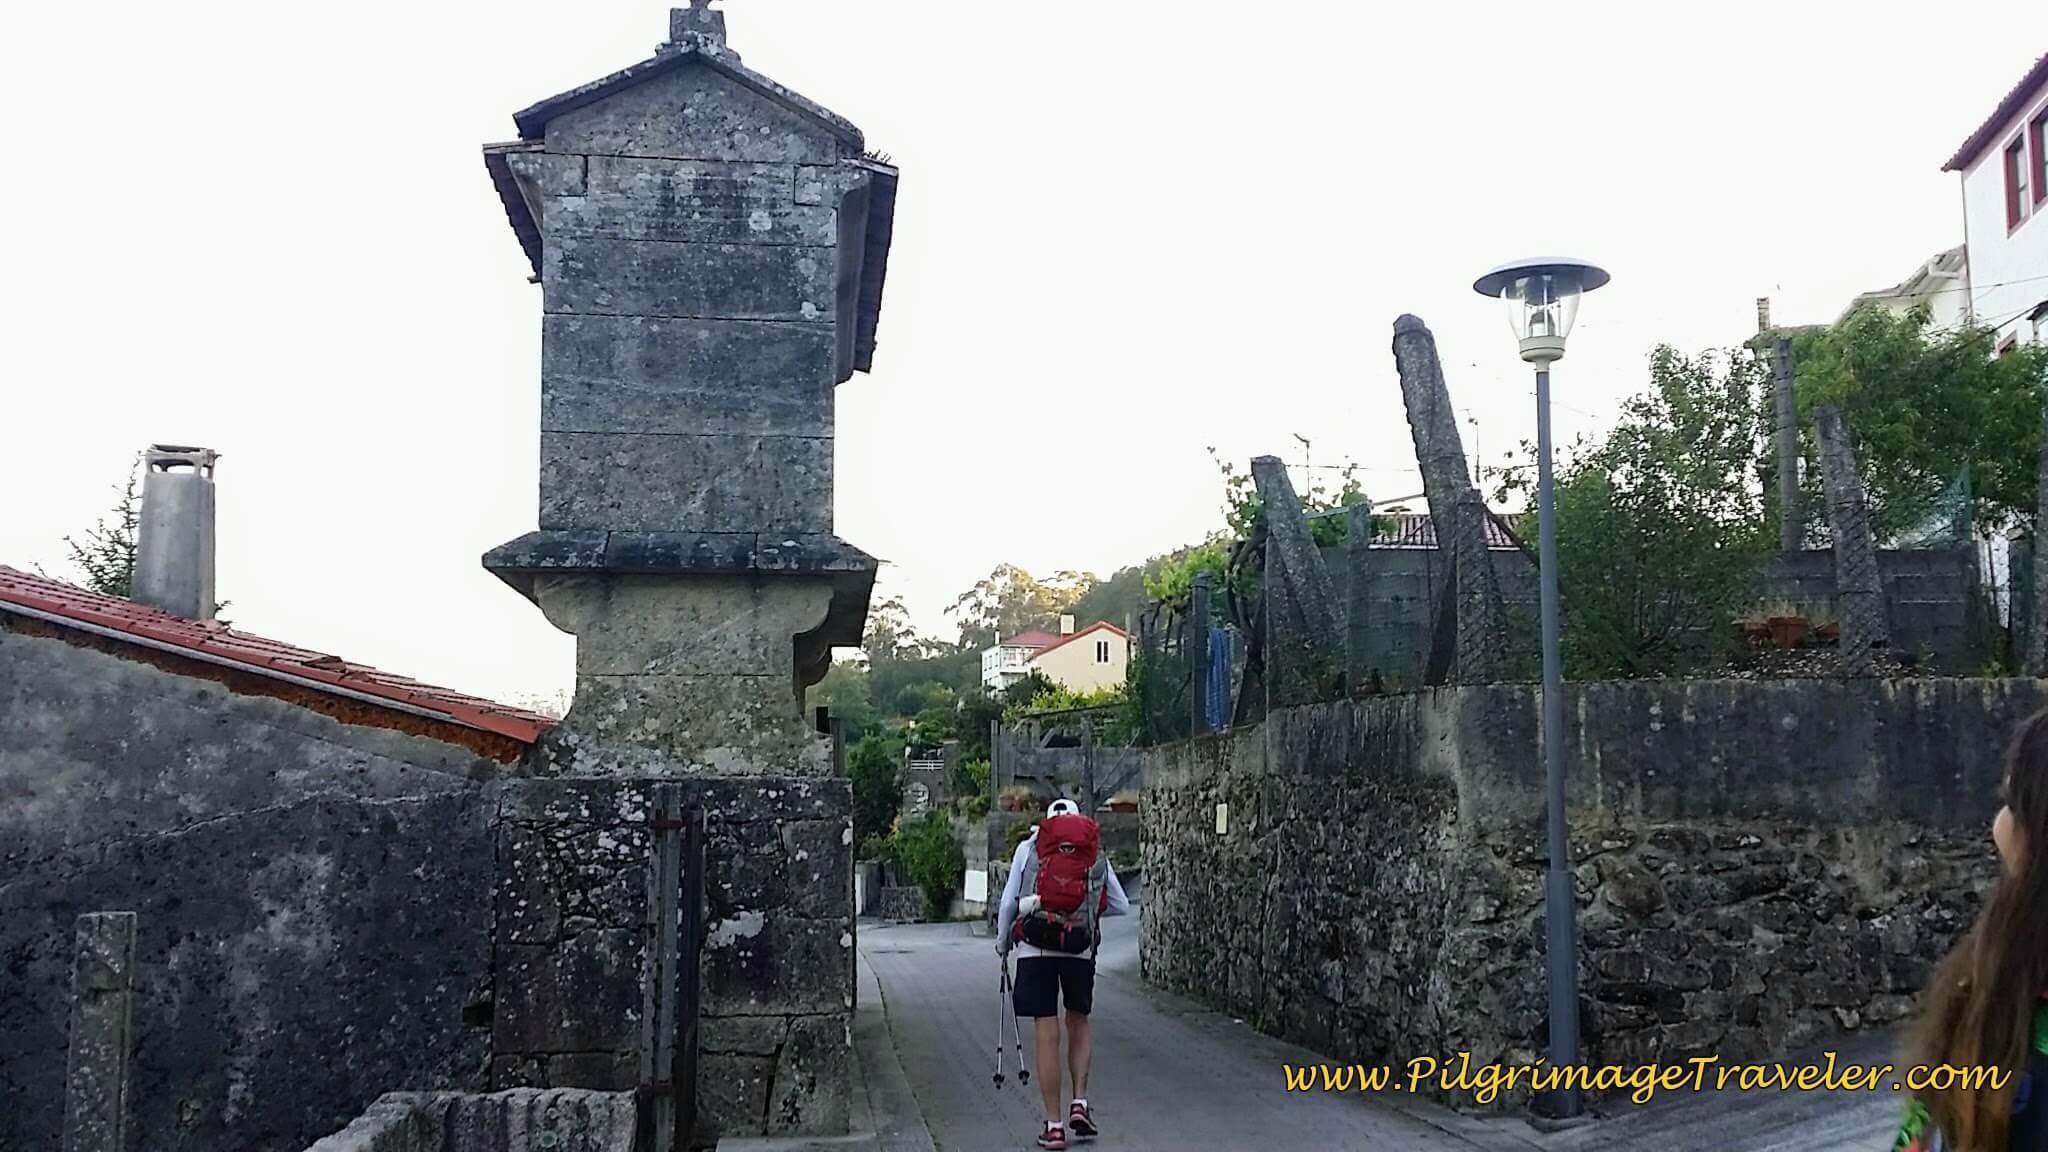 Hórreo Along the Rúa do Pilar in Pontecesures on Day Twenty-Four, Portuguese Way